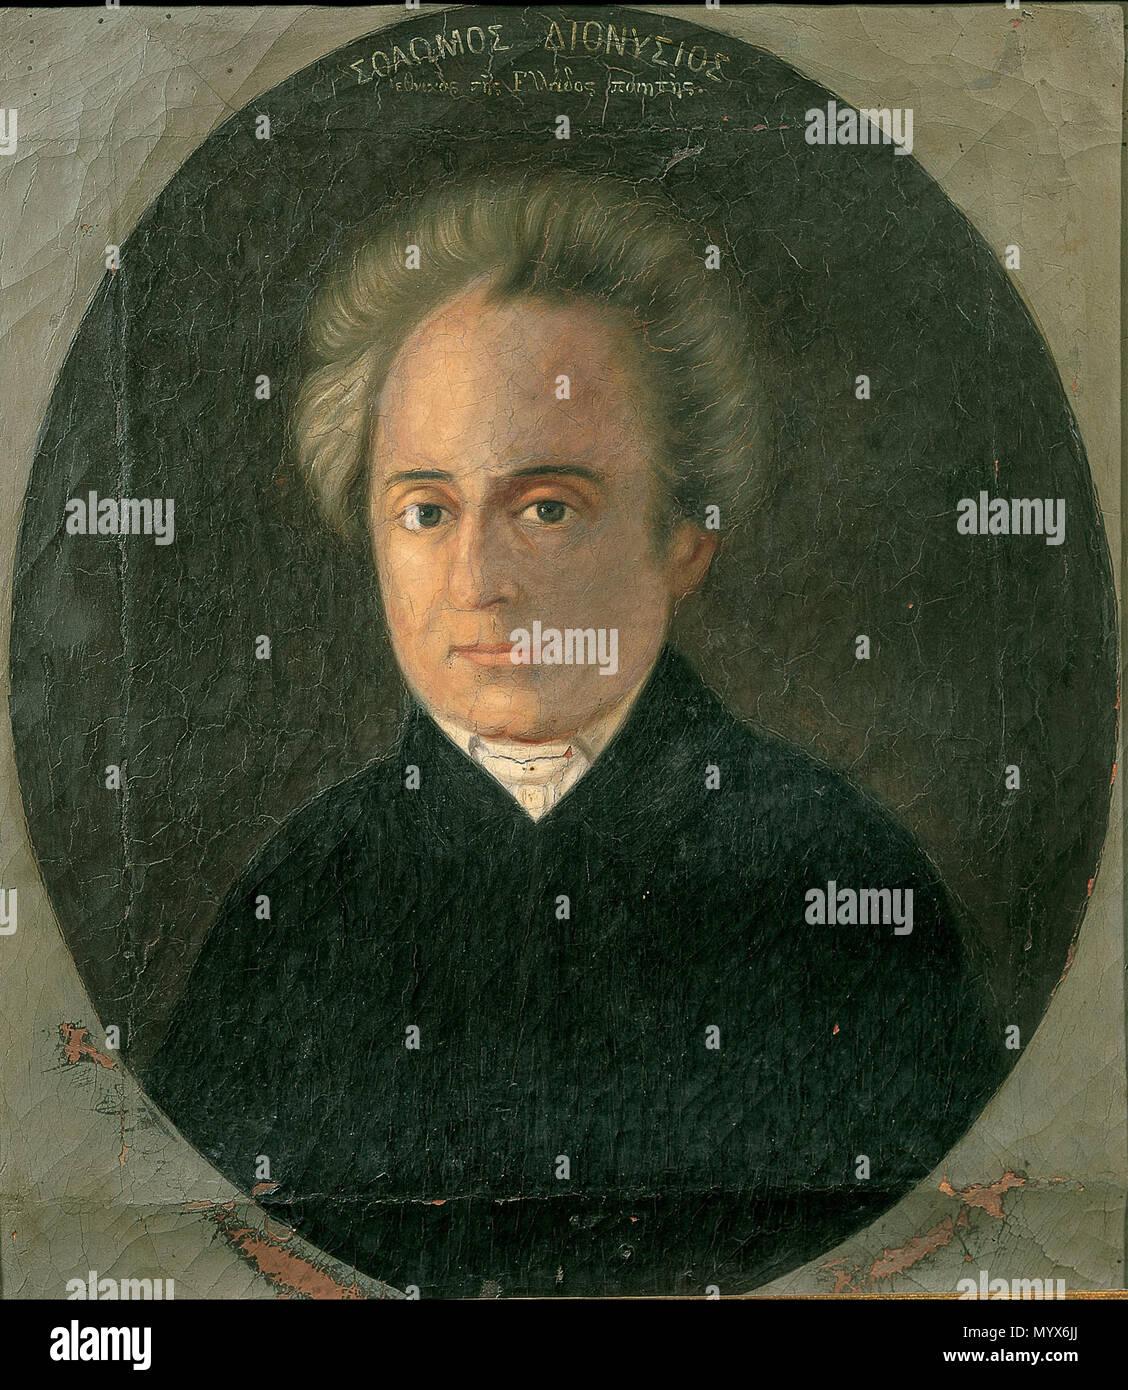 . Dionisios Solomos . (1800 - 1899) 2 Dionisios Solomos - Google Art Project Immagini Stock